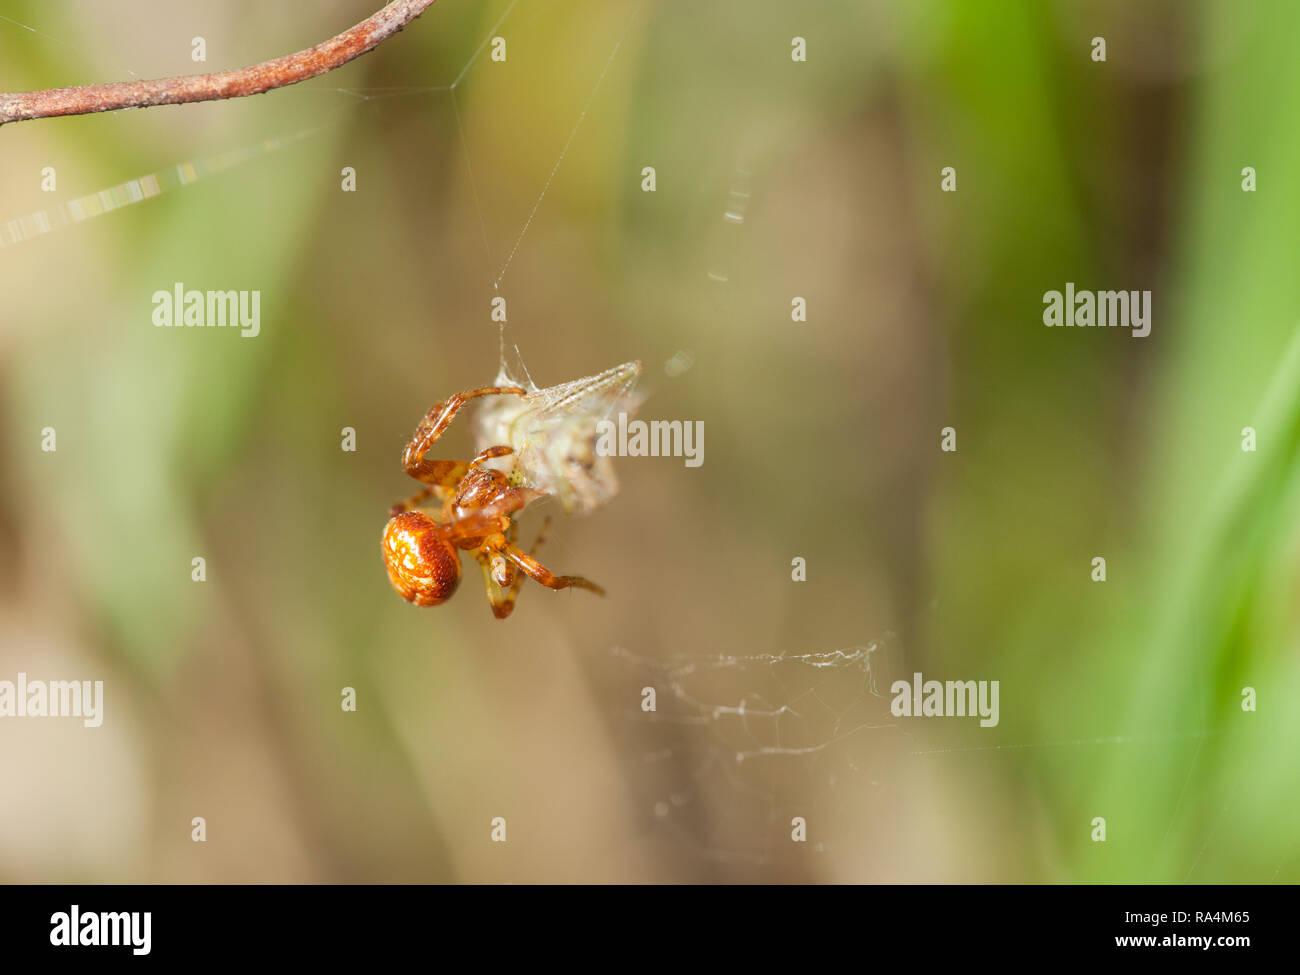 Strawberry wheel weaving spider - Stock Image